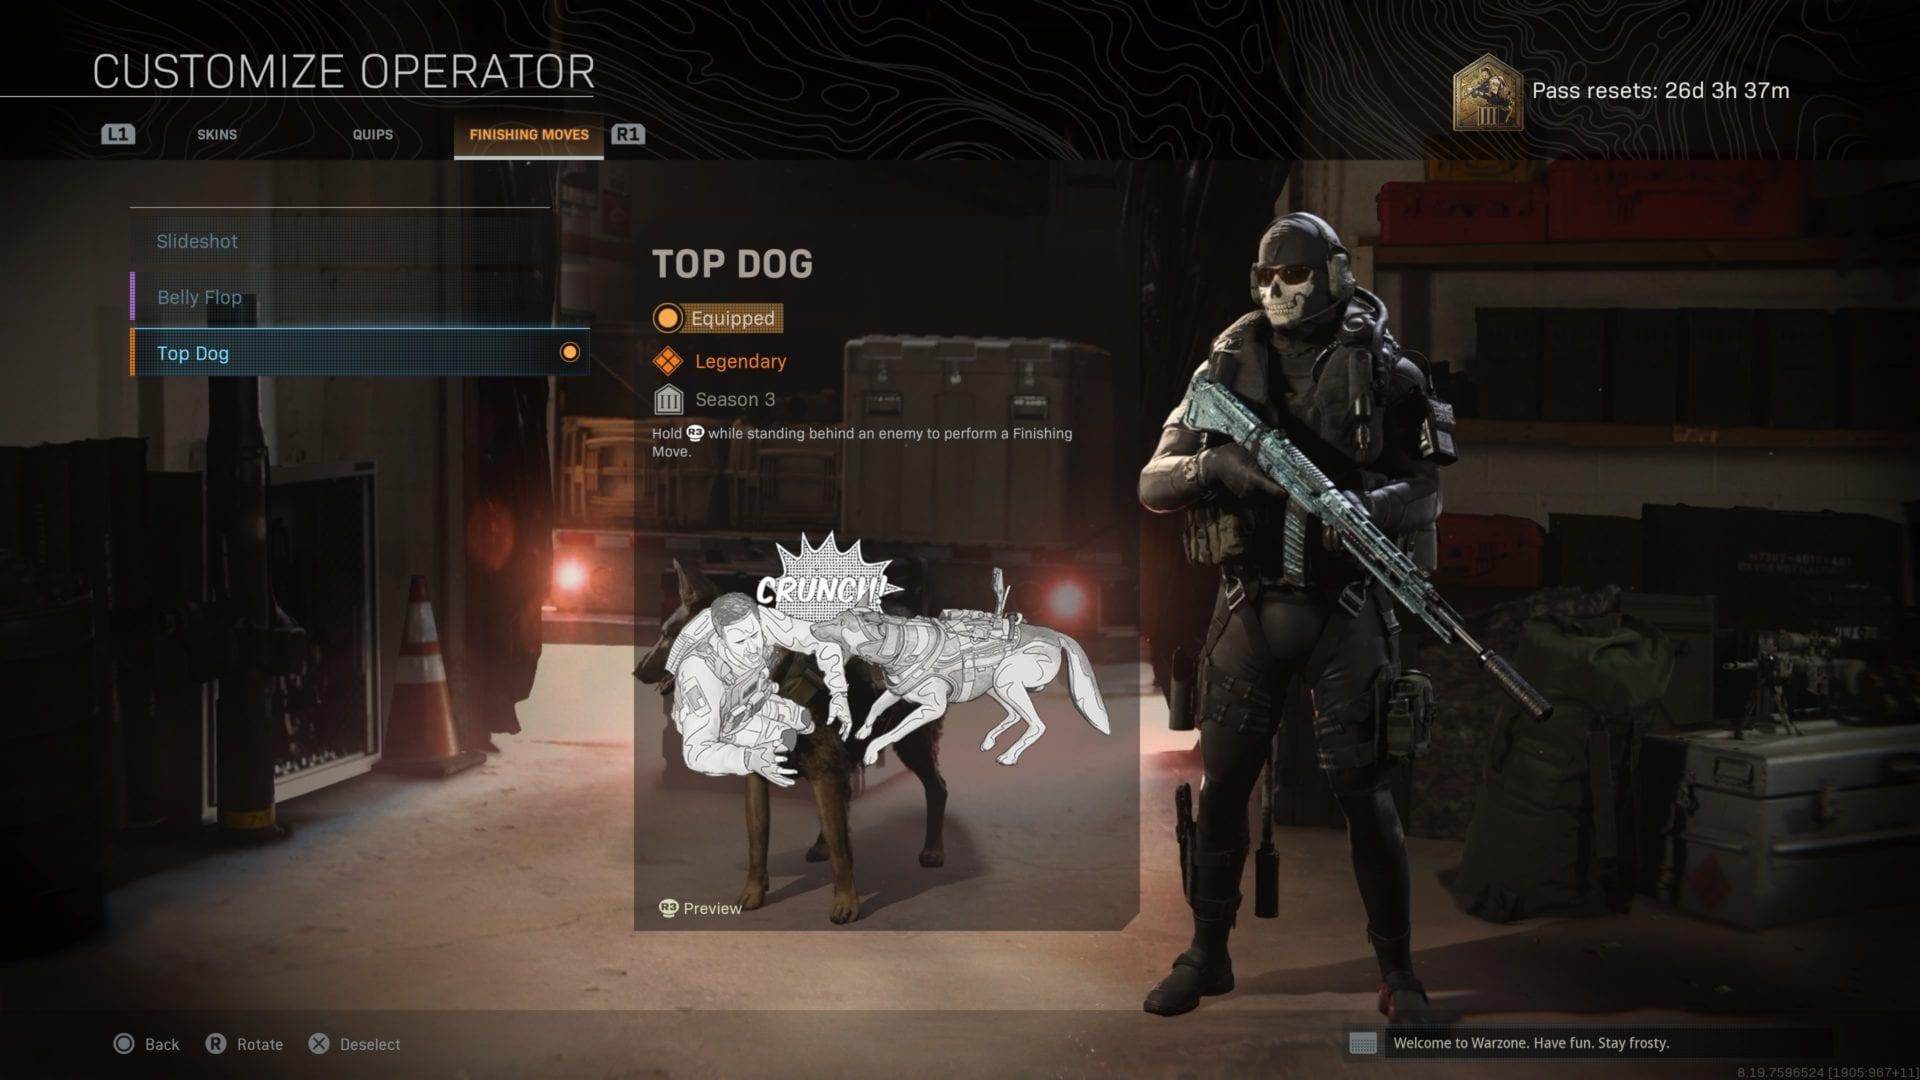 zona de guerra, consigue perro